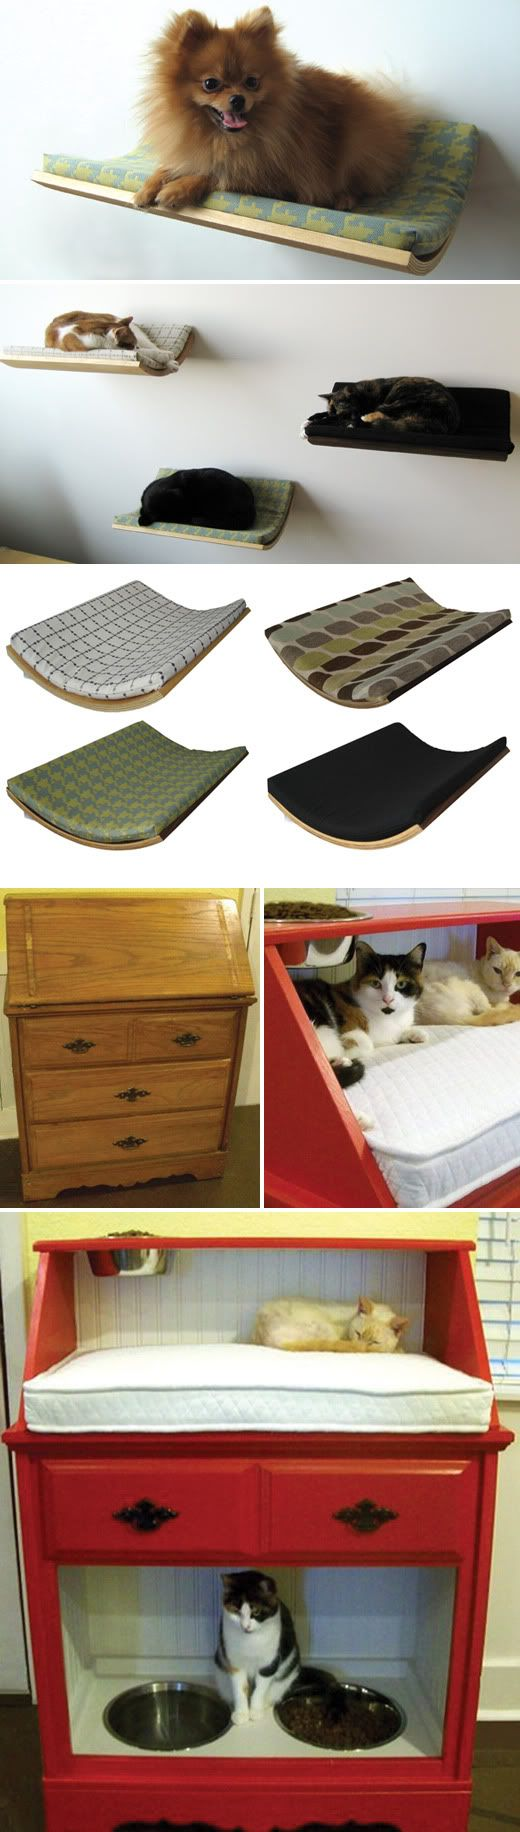 127 best make the cats happy images on pinterest cat stuff pets